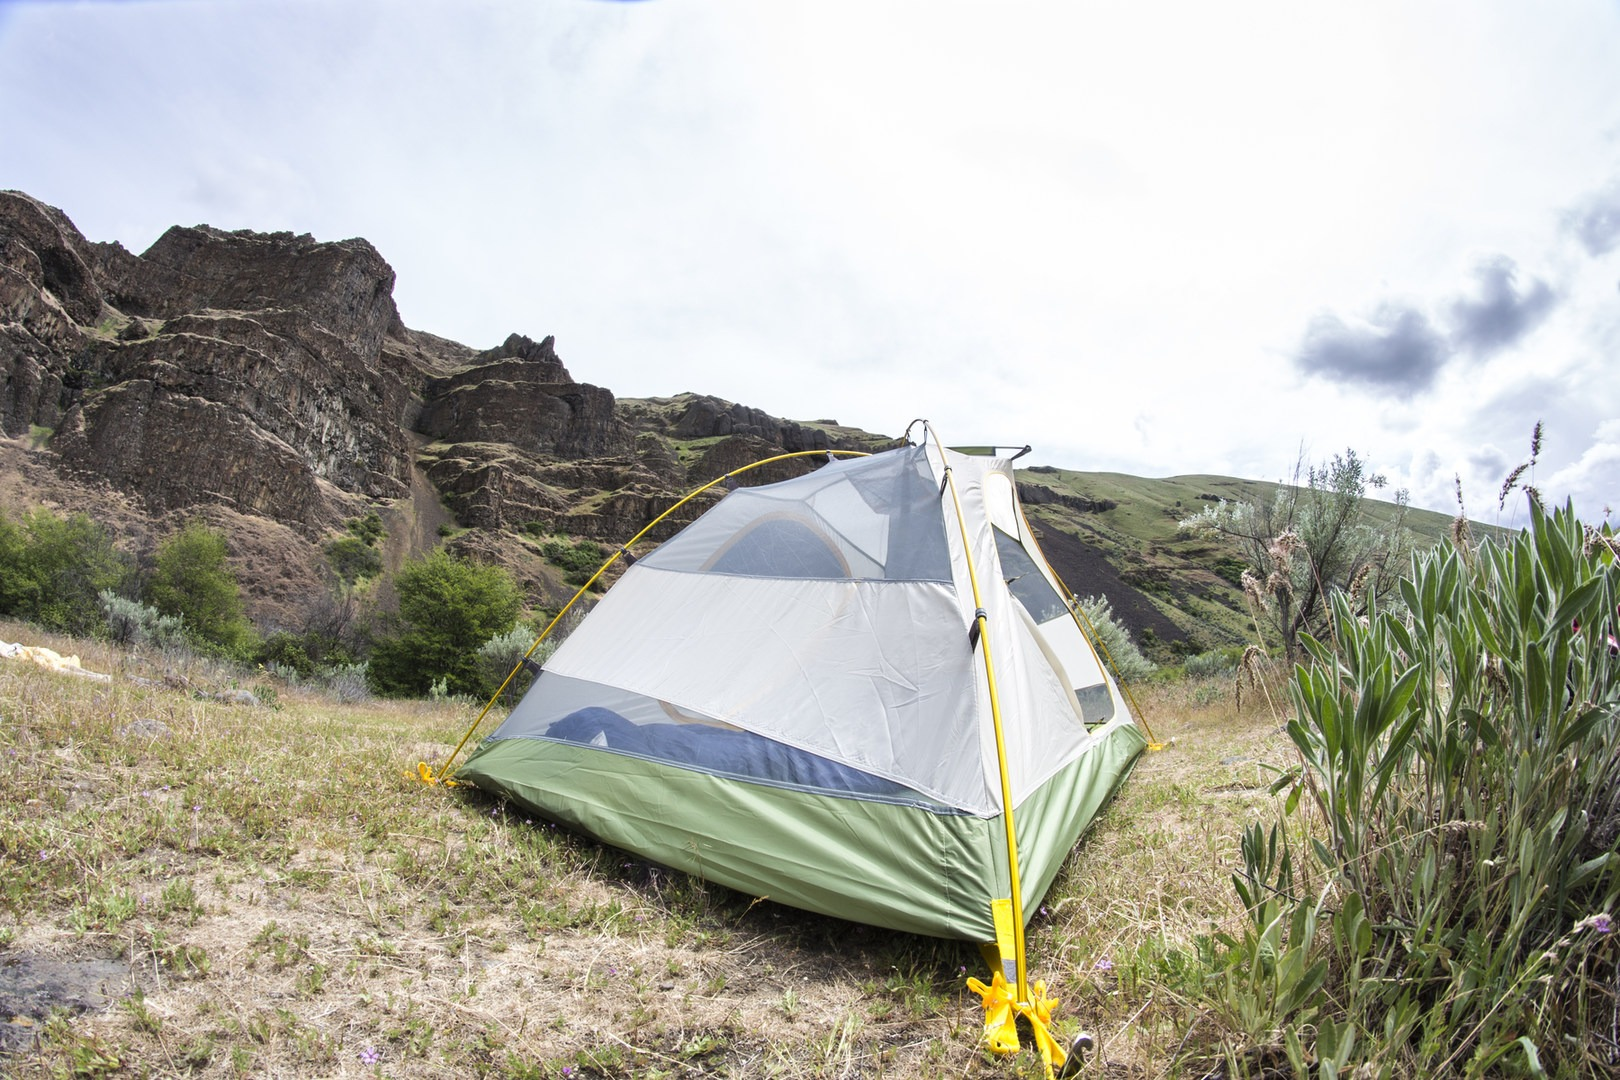 Mountainsmith Morrison Evo 2 · 3-aluminum alloy poles stakes and a durable poly tent.- Mountainsmith & Mountainsmith Morrison Evo 2 - Outdoor Project